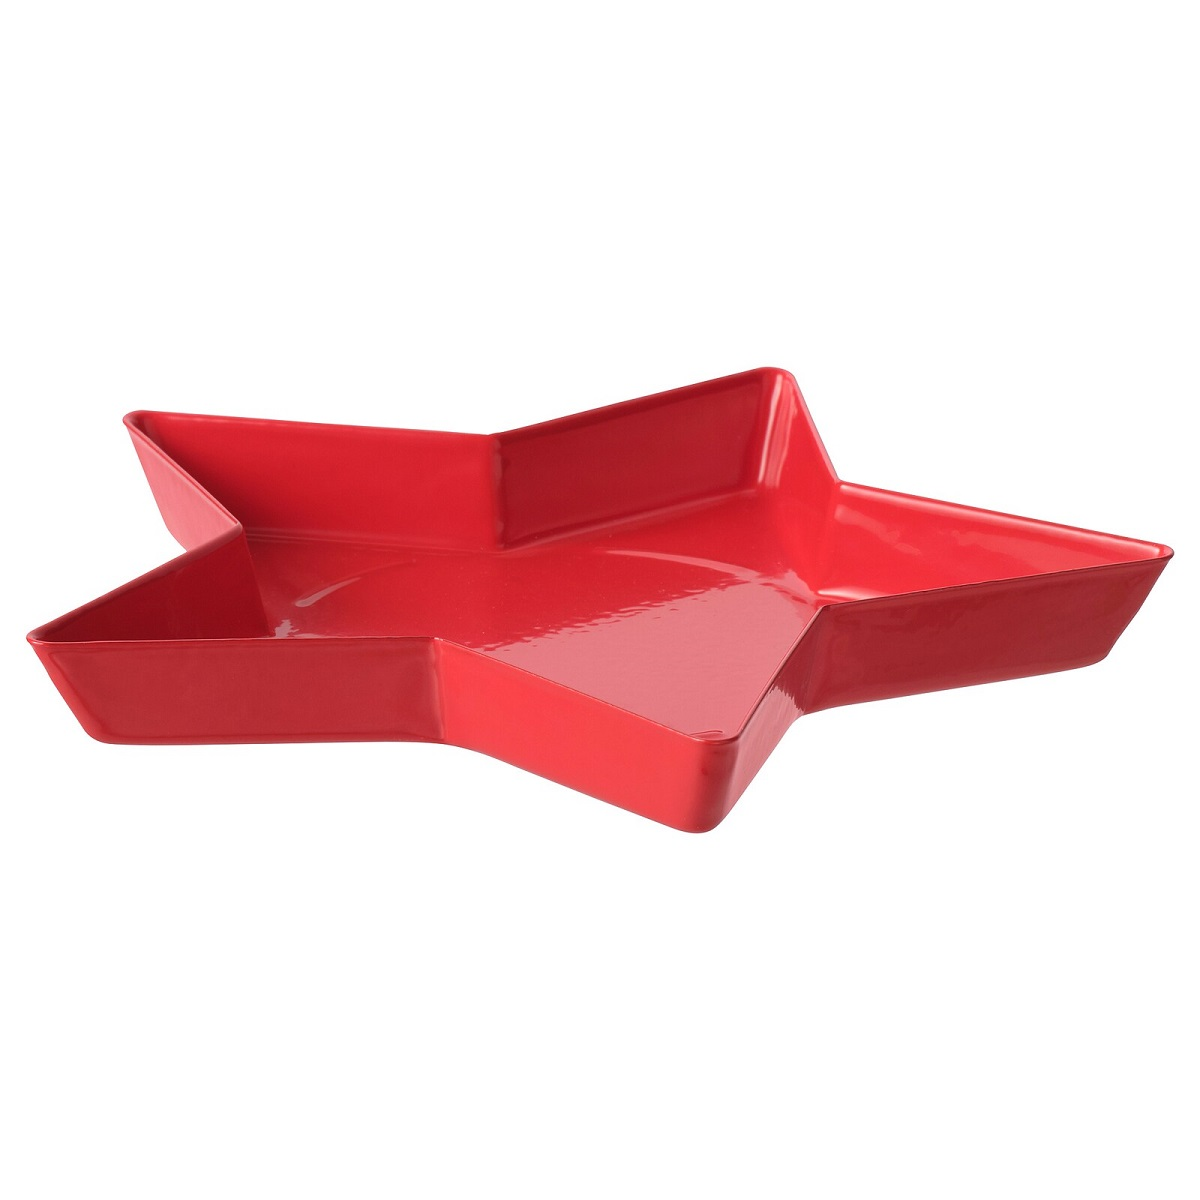 جا شمعی ایکیا مدل ستاره کد 50403216